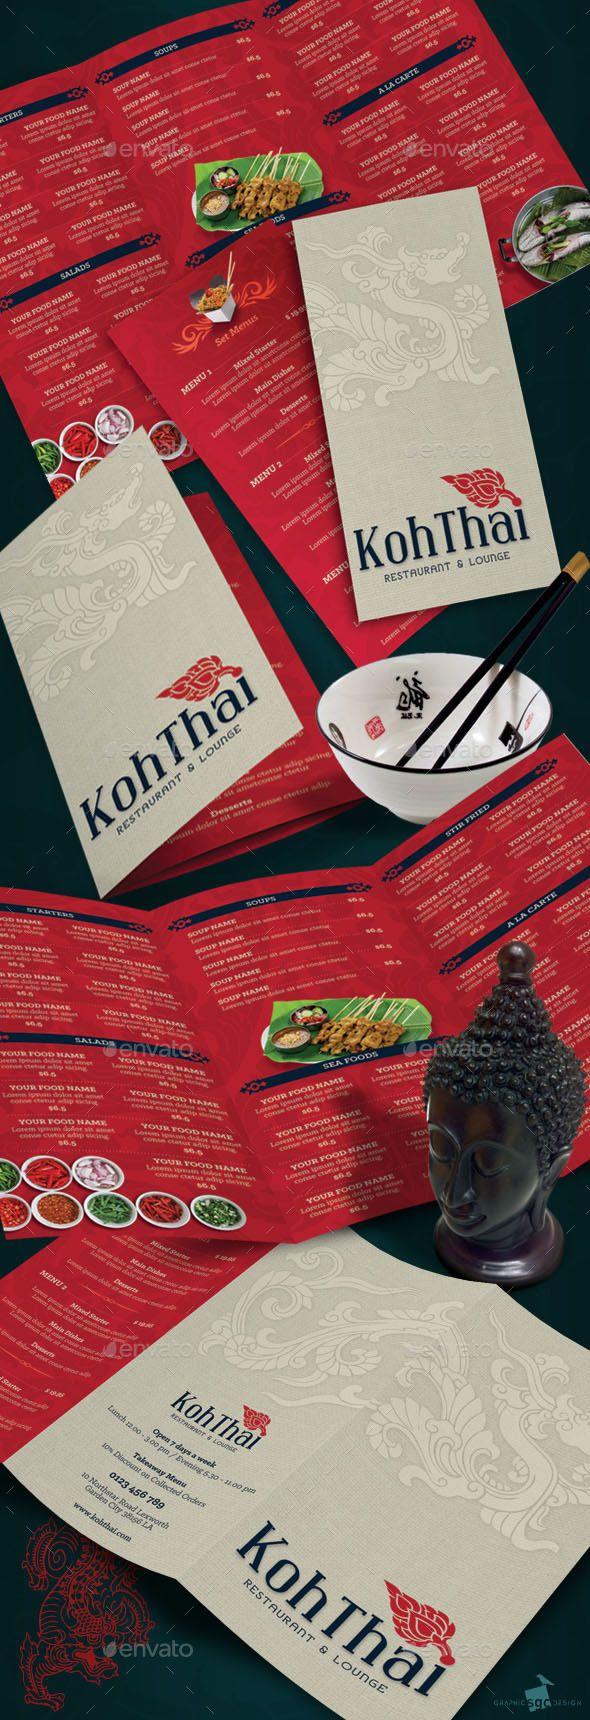 Thai Restaurant Menu — Photoshop PSD #thailand #eastern • Available here → https://graphicriver.net/item/thai-restaurant-menu/8921308?ref=pxcr